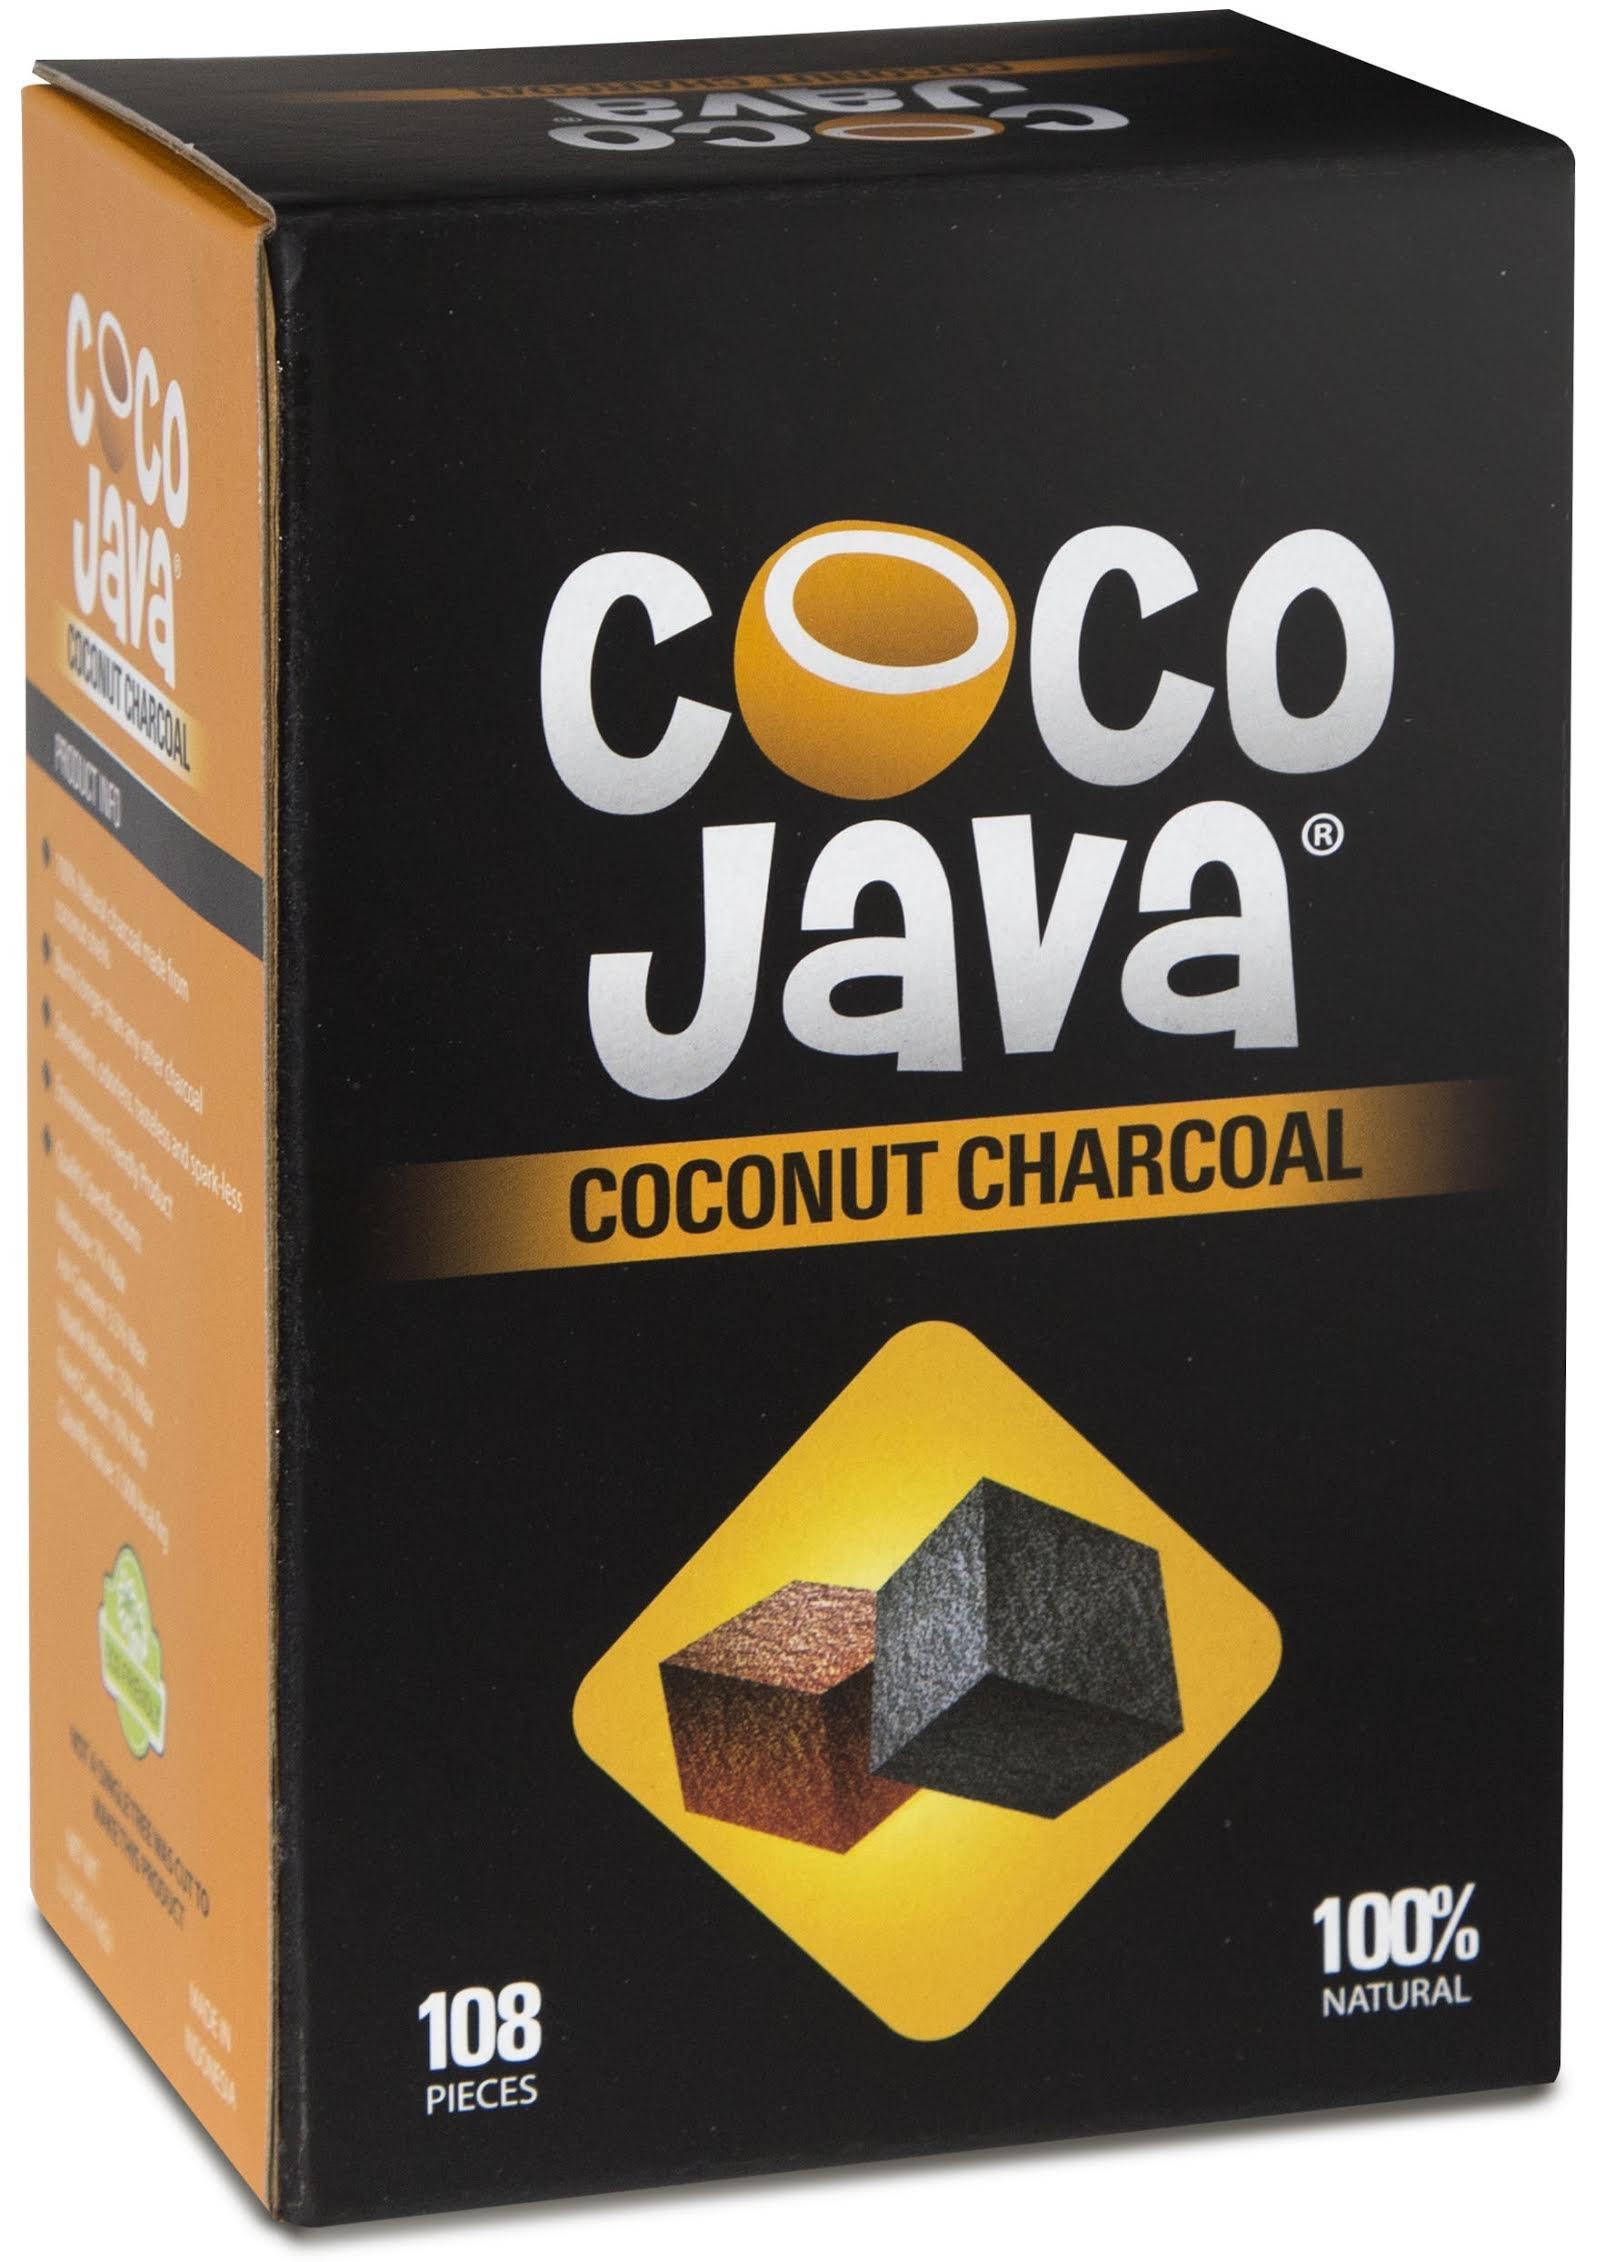 Coco Java Natural Coconut Charcoal